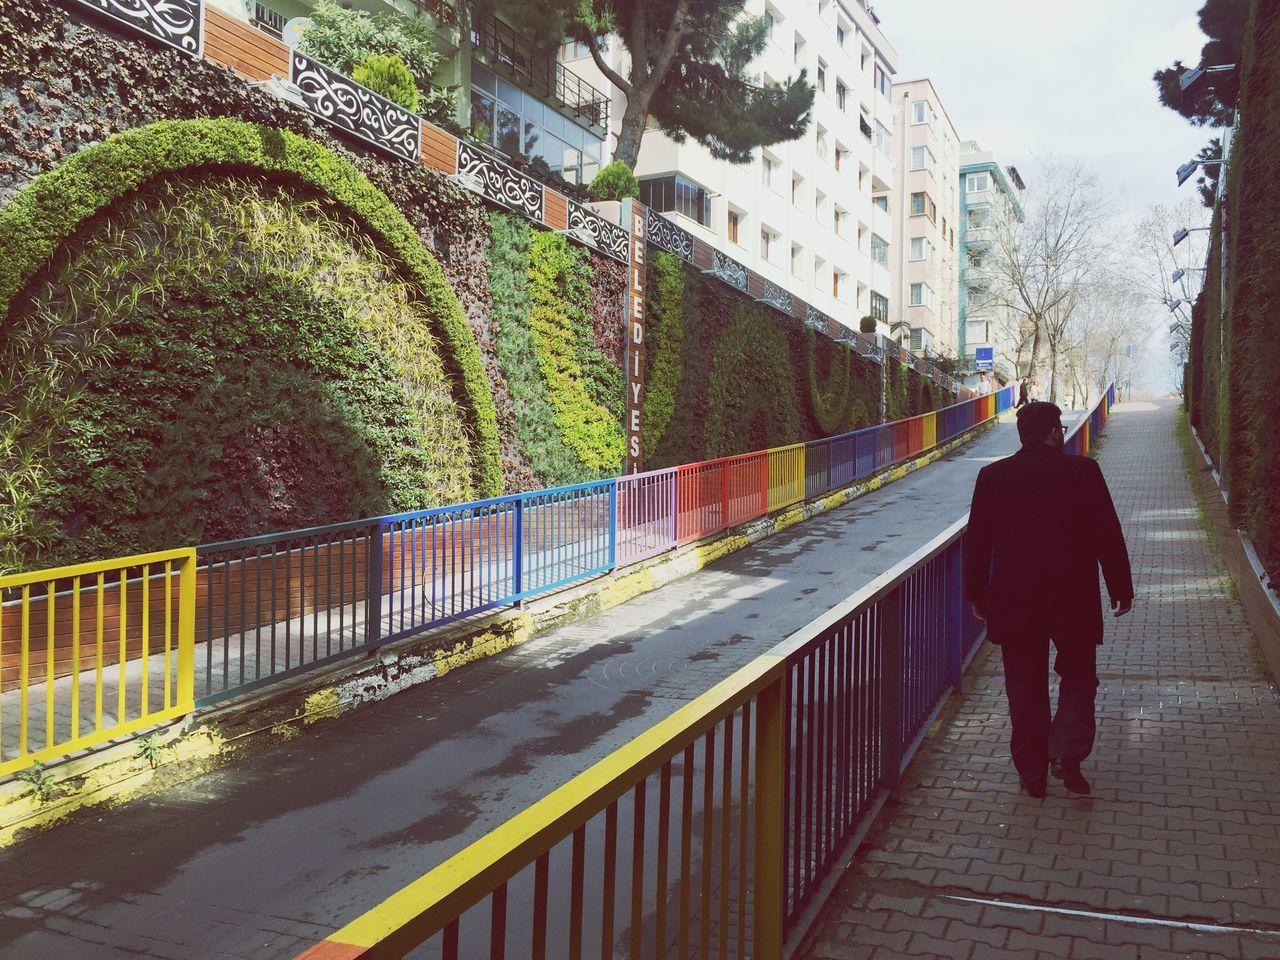 Rainbow street 🙏🏼 Rainbow Rainbow Street Rainbow Fence Into The Wild Wild Life Wildlife & Nature Nature